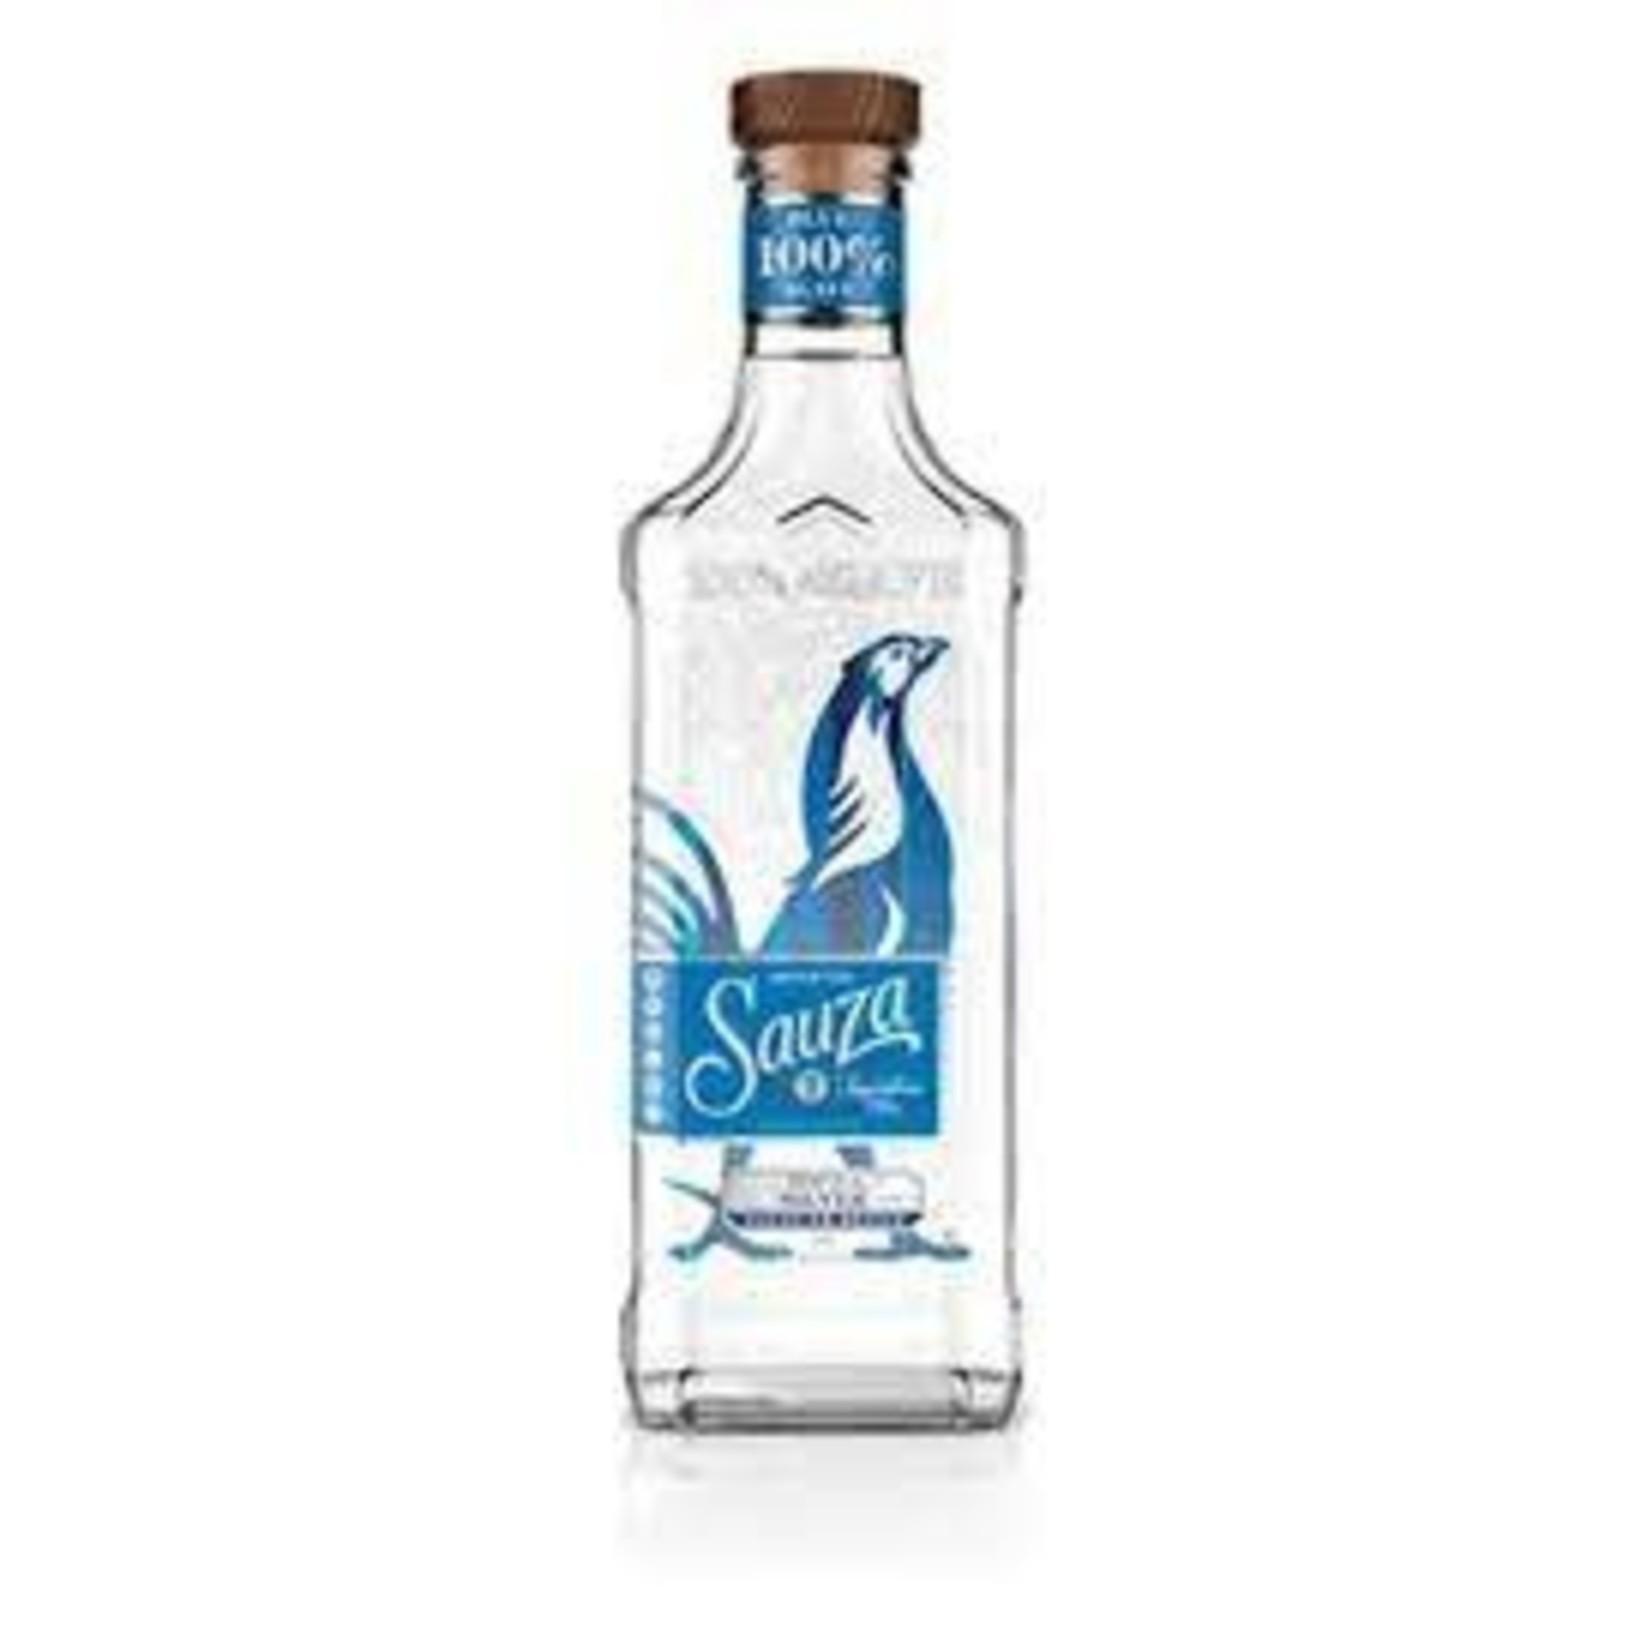 Spirits Sauza Tequila Silver